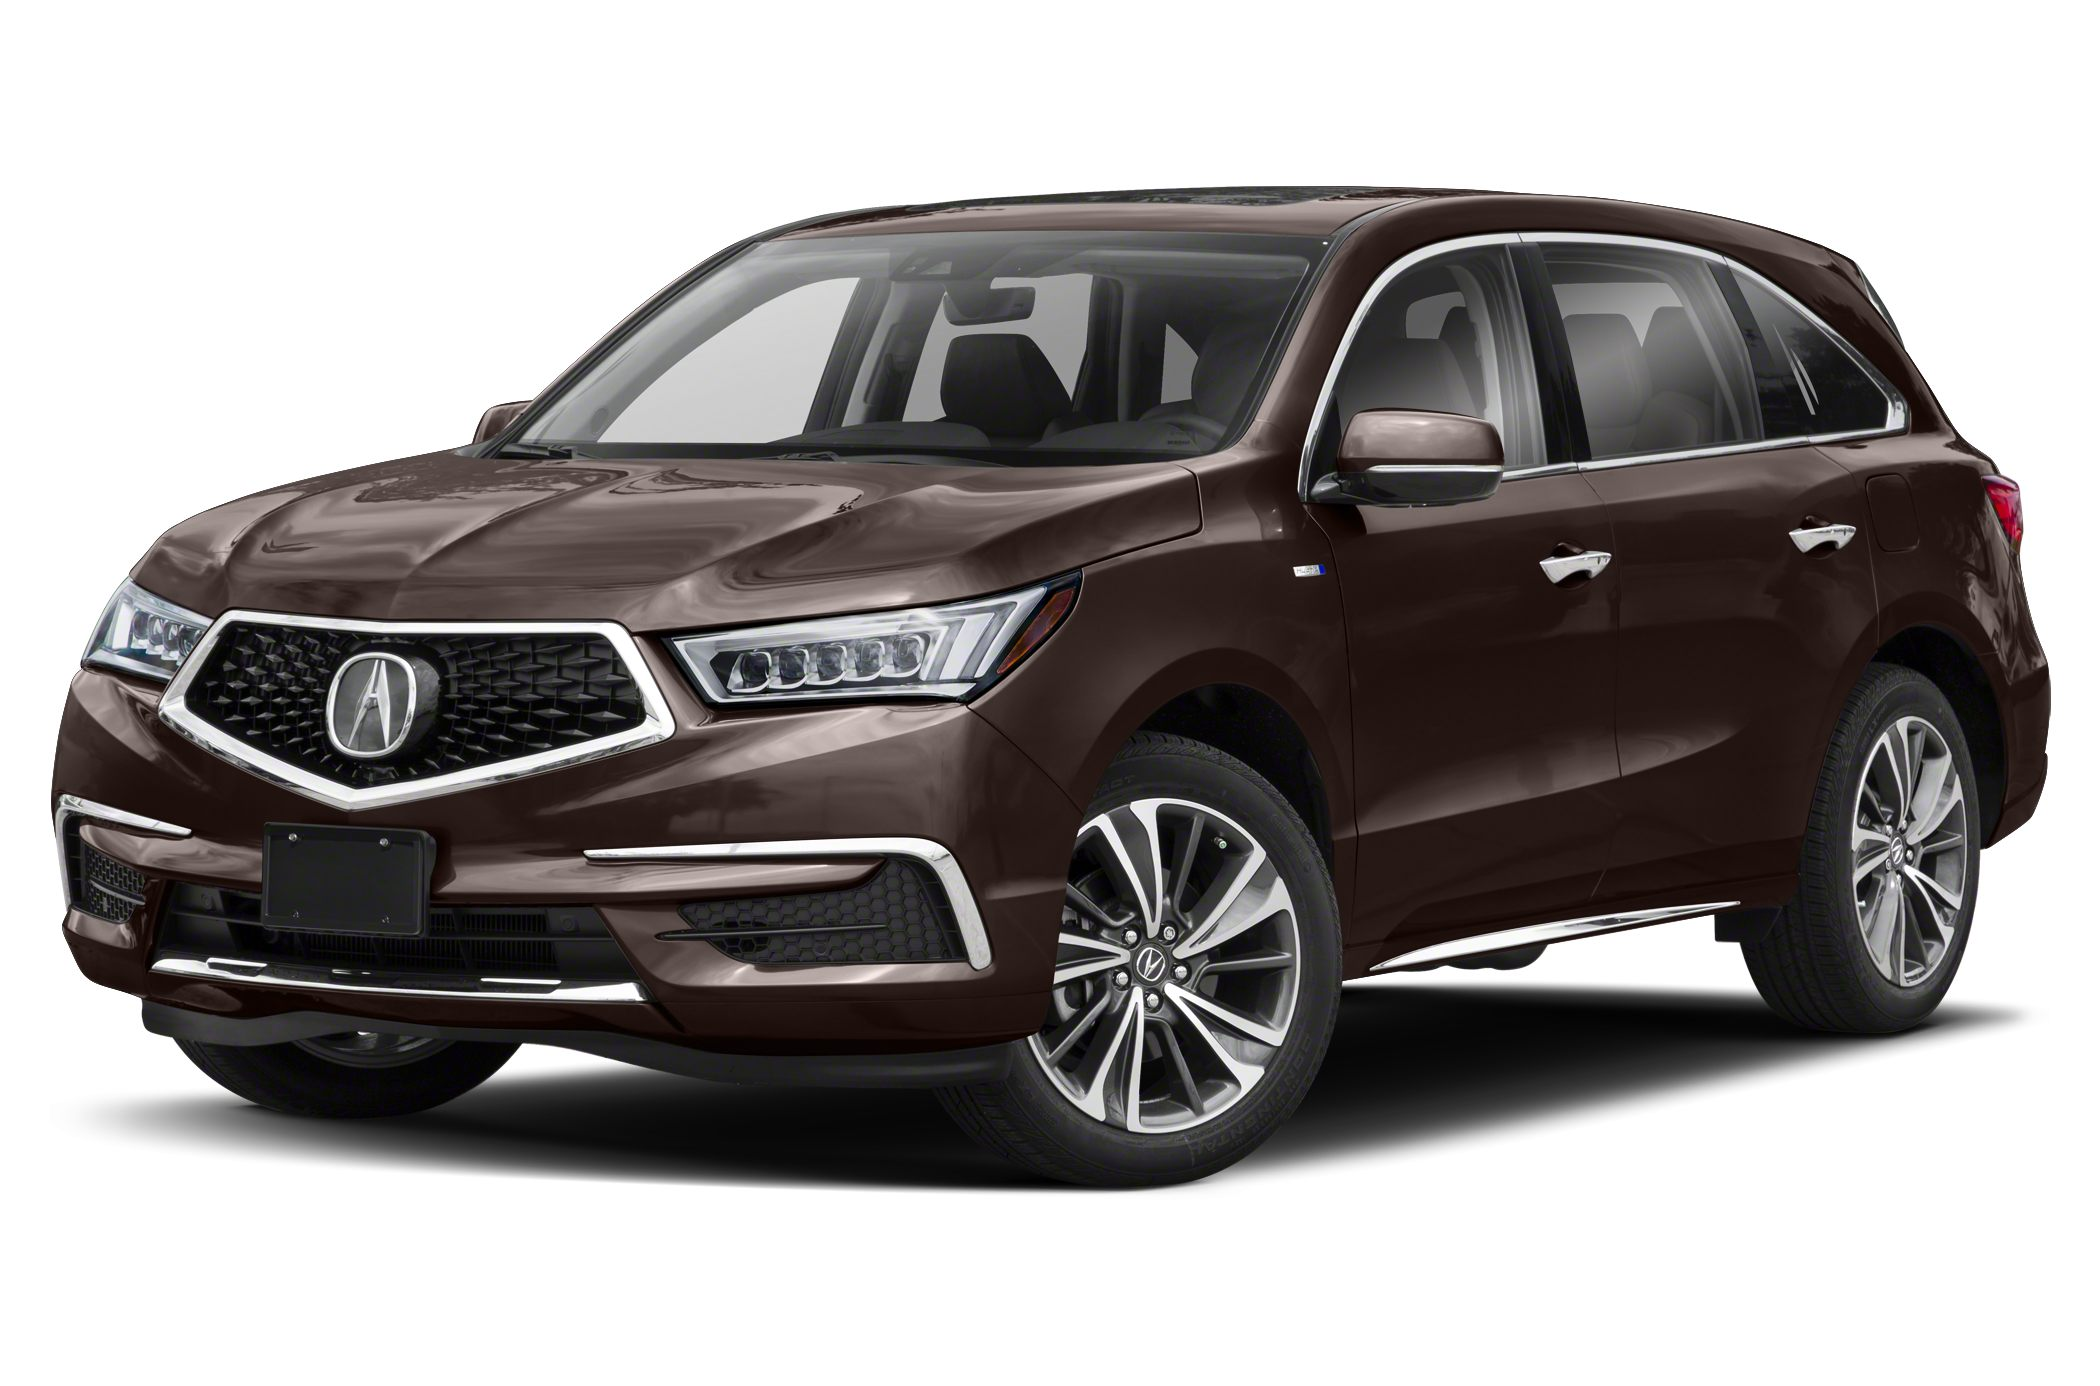 2020 Acura MDX Hybrid Ratings